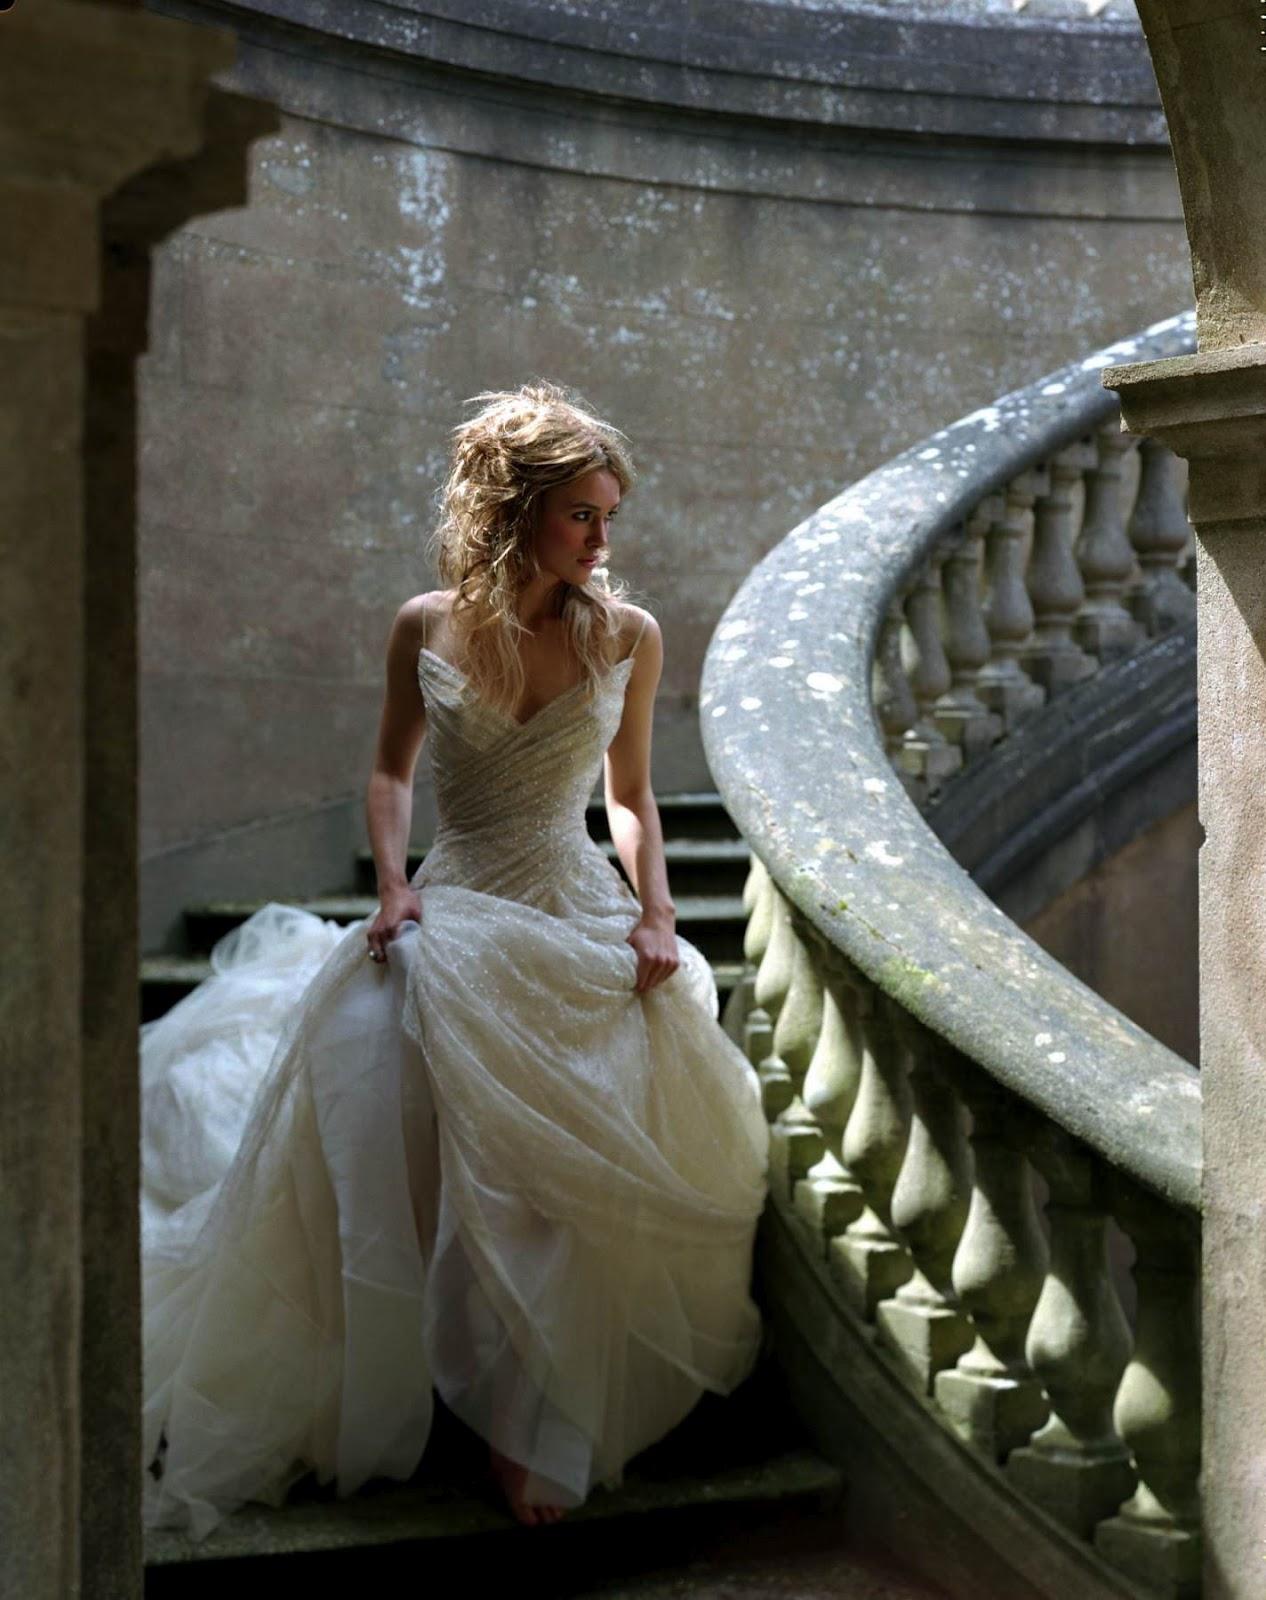 http://2.bp.blogspot.com/-5WZInRnb3uY/UALz9mQvIJI/AAAAAAAAATk/qL0TJki92dg/s1600/Keira+Knightley+(758).jpg